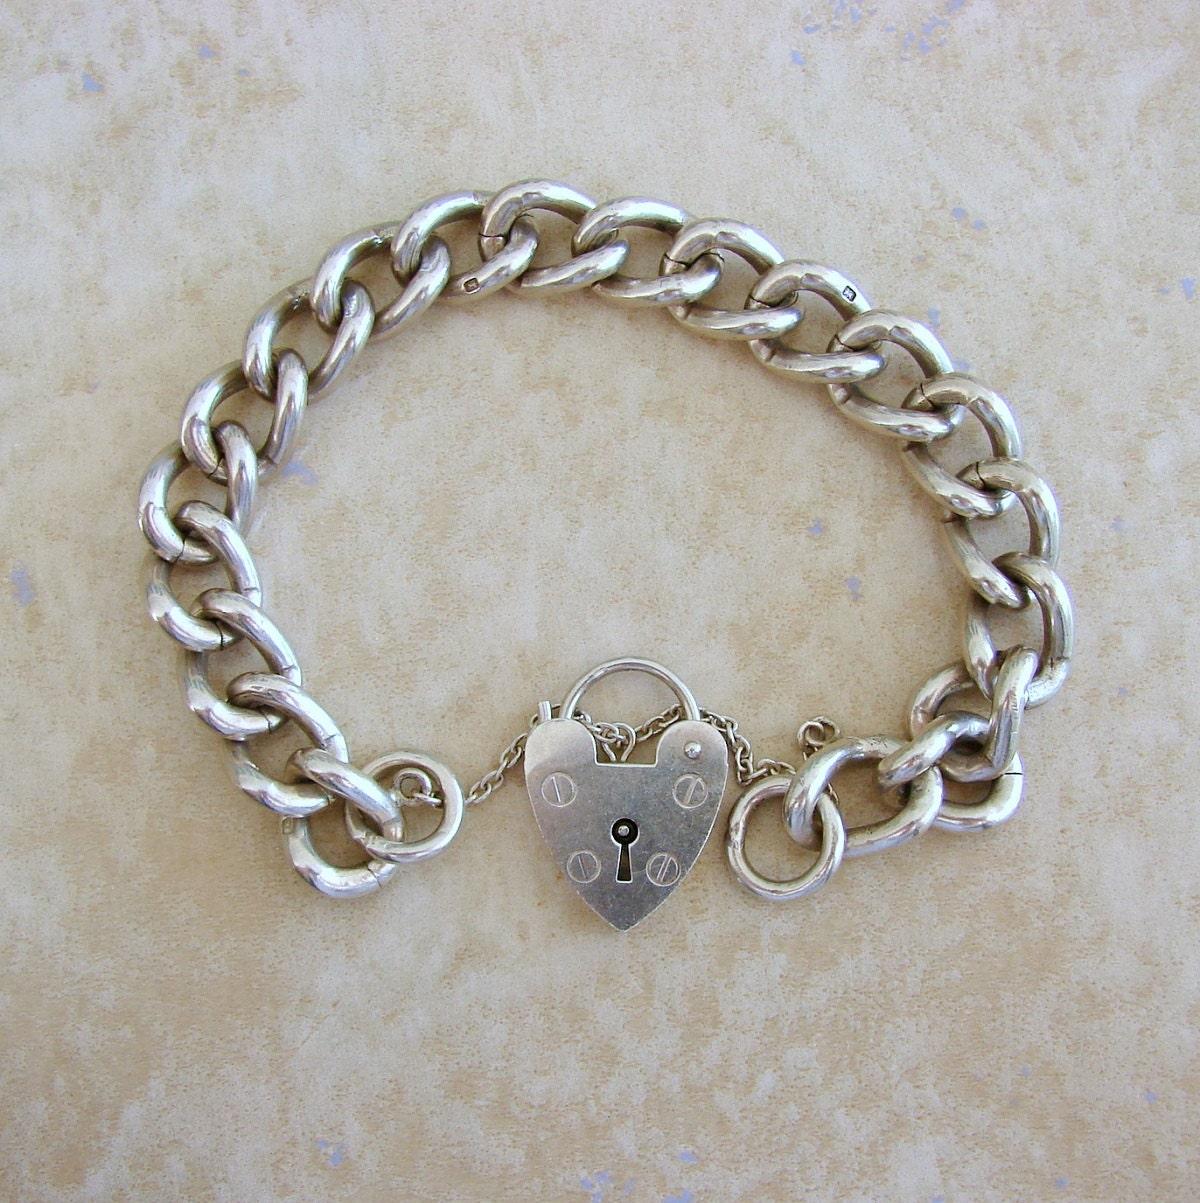 Starter Charm Bracelet: Large Single Link Starter Charm Vintage Silver Bracelet Heart